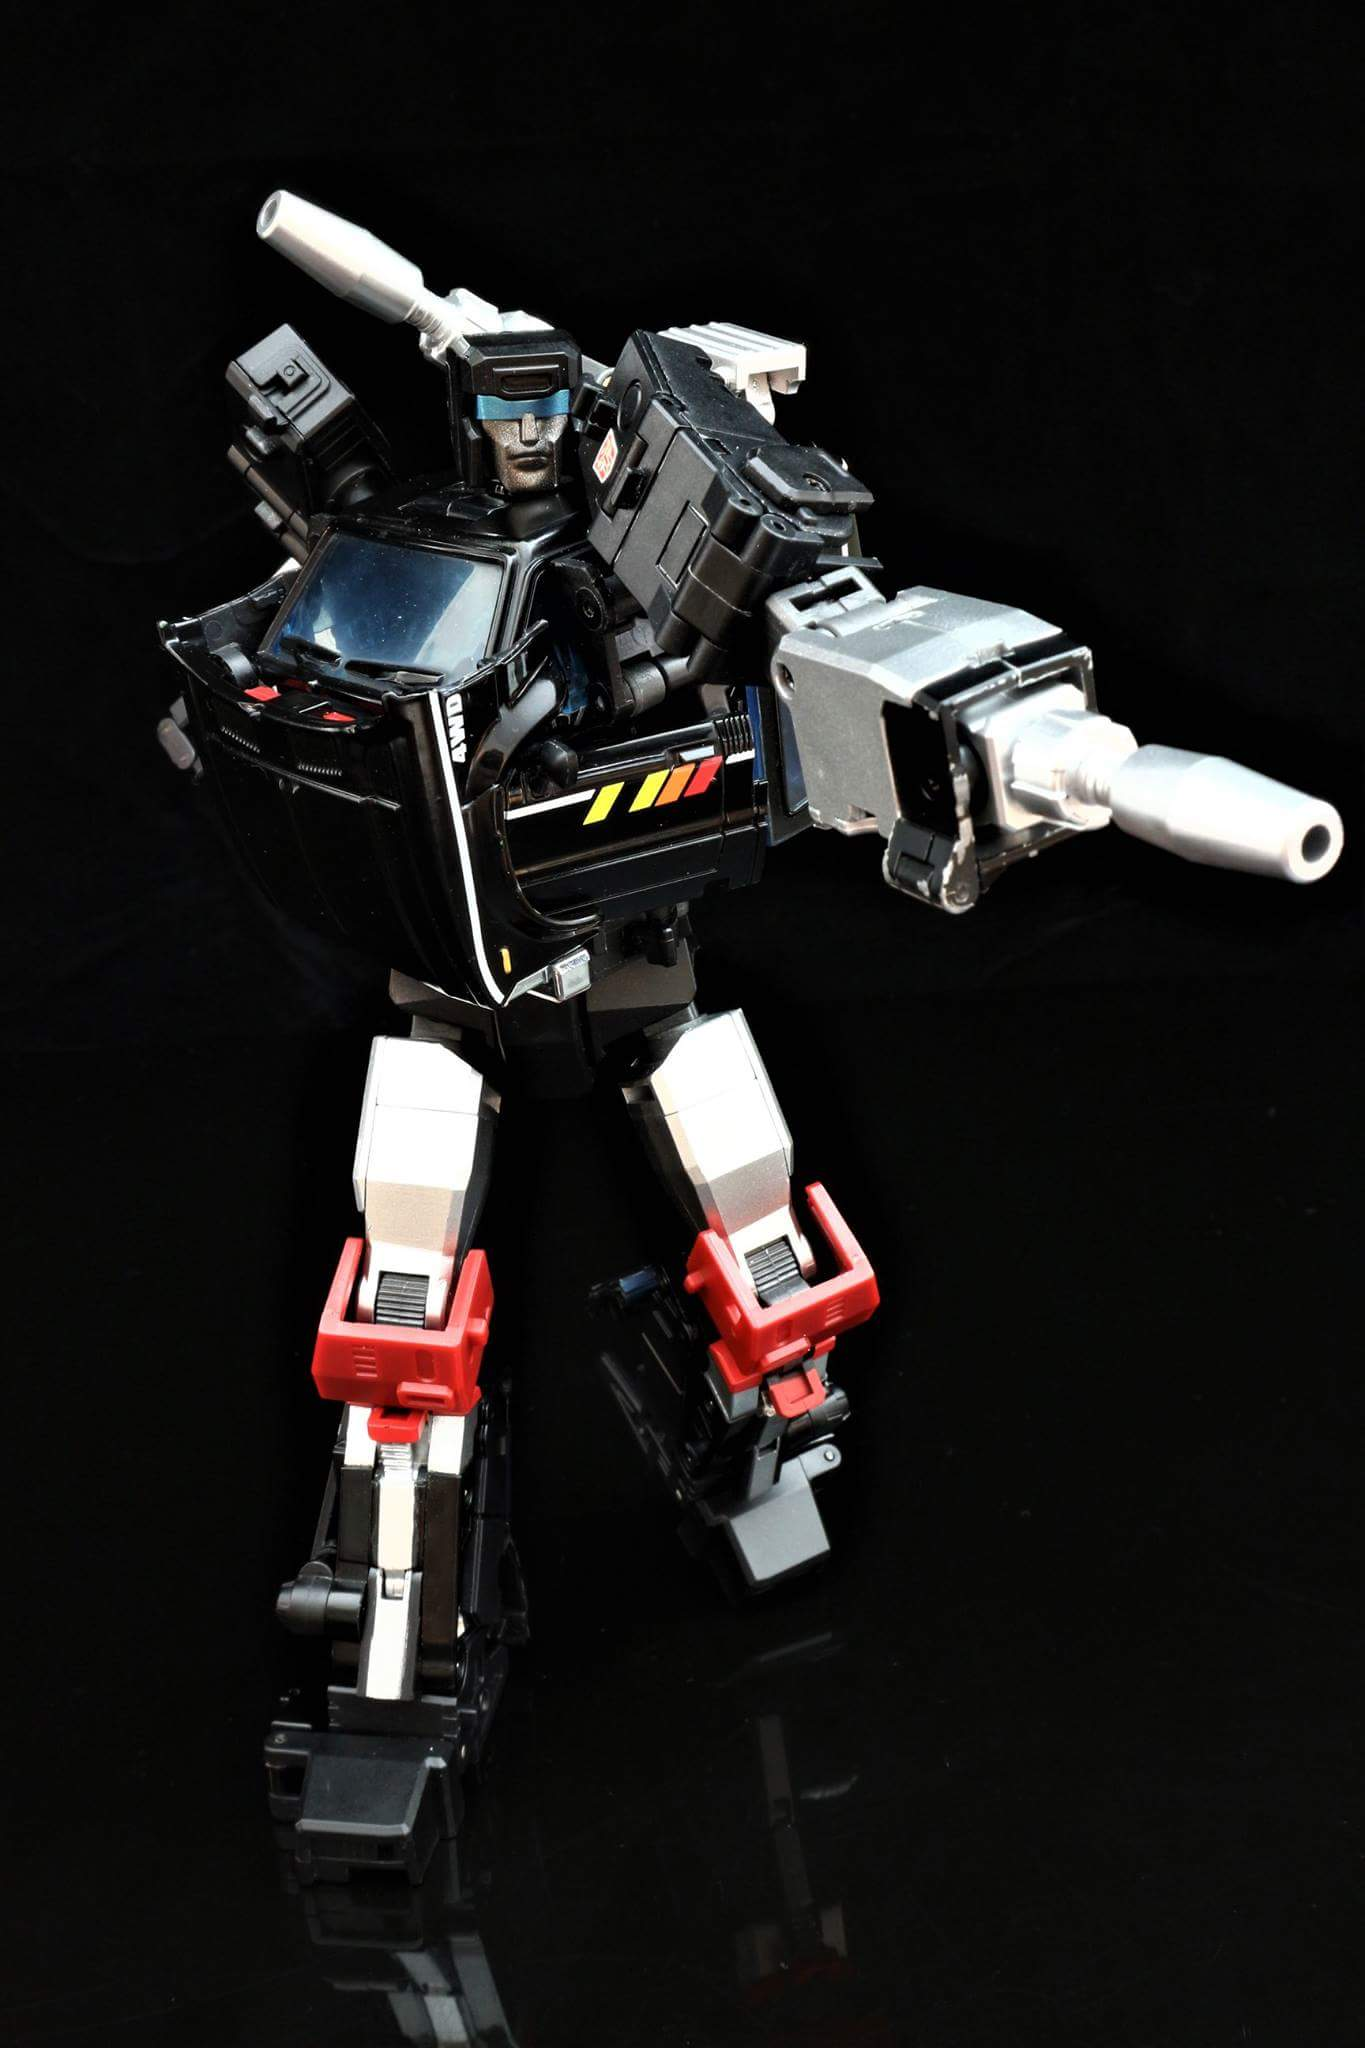 [BadCube] Produit Tiers - Jouet OTS-11 Speedbump - aka Trailbreaker/Glouton - Page 2 NZvTwSOo